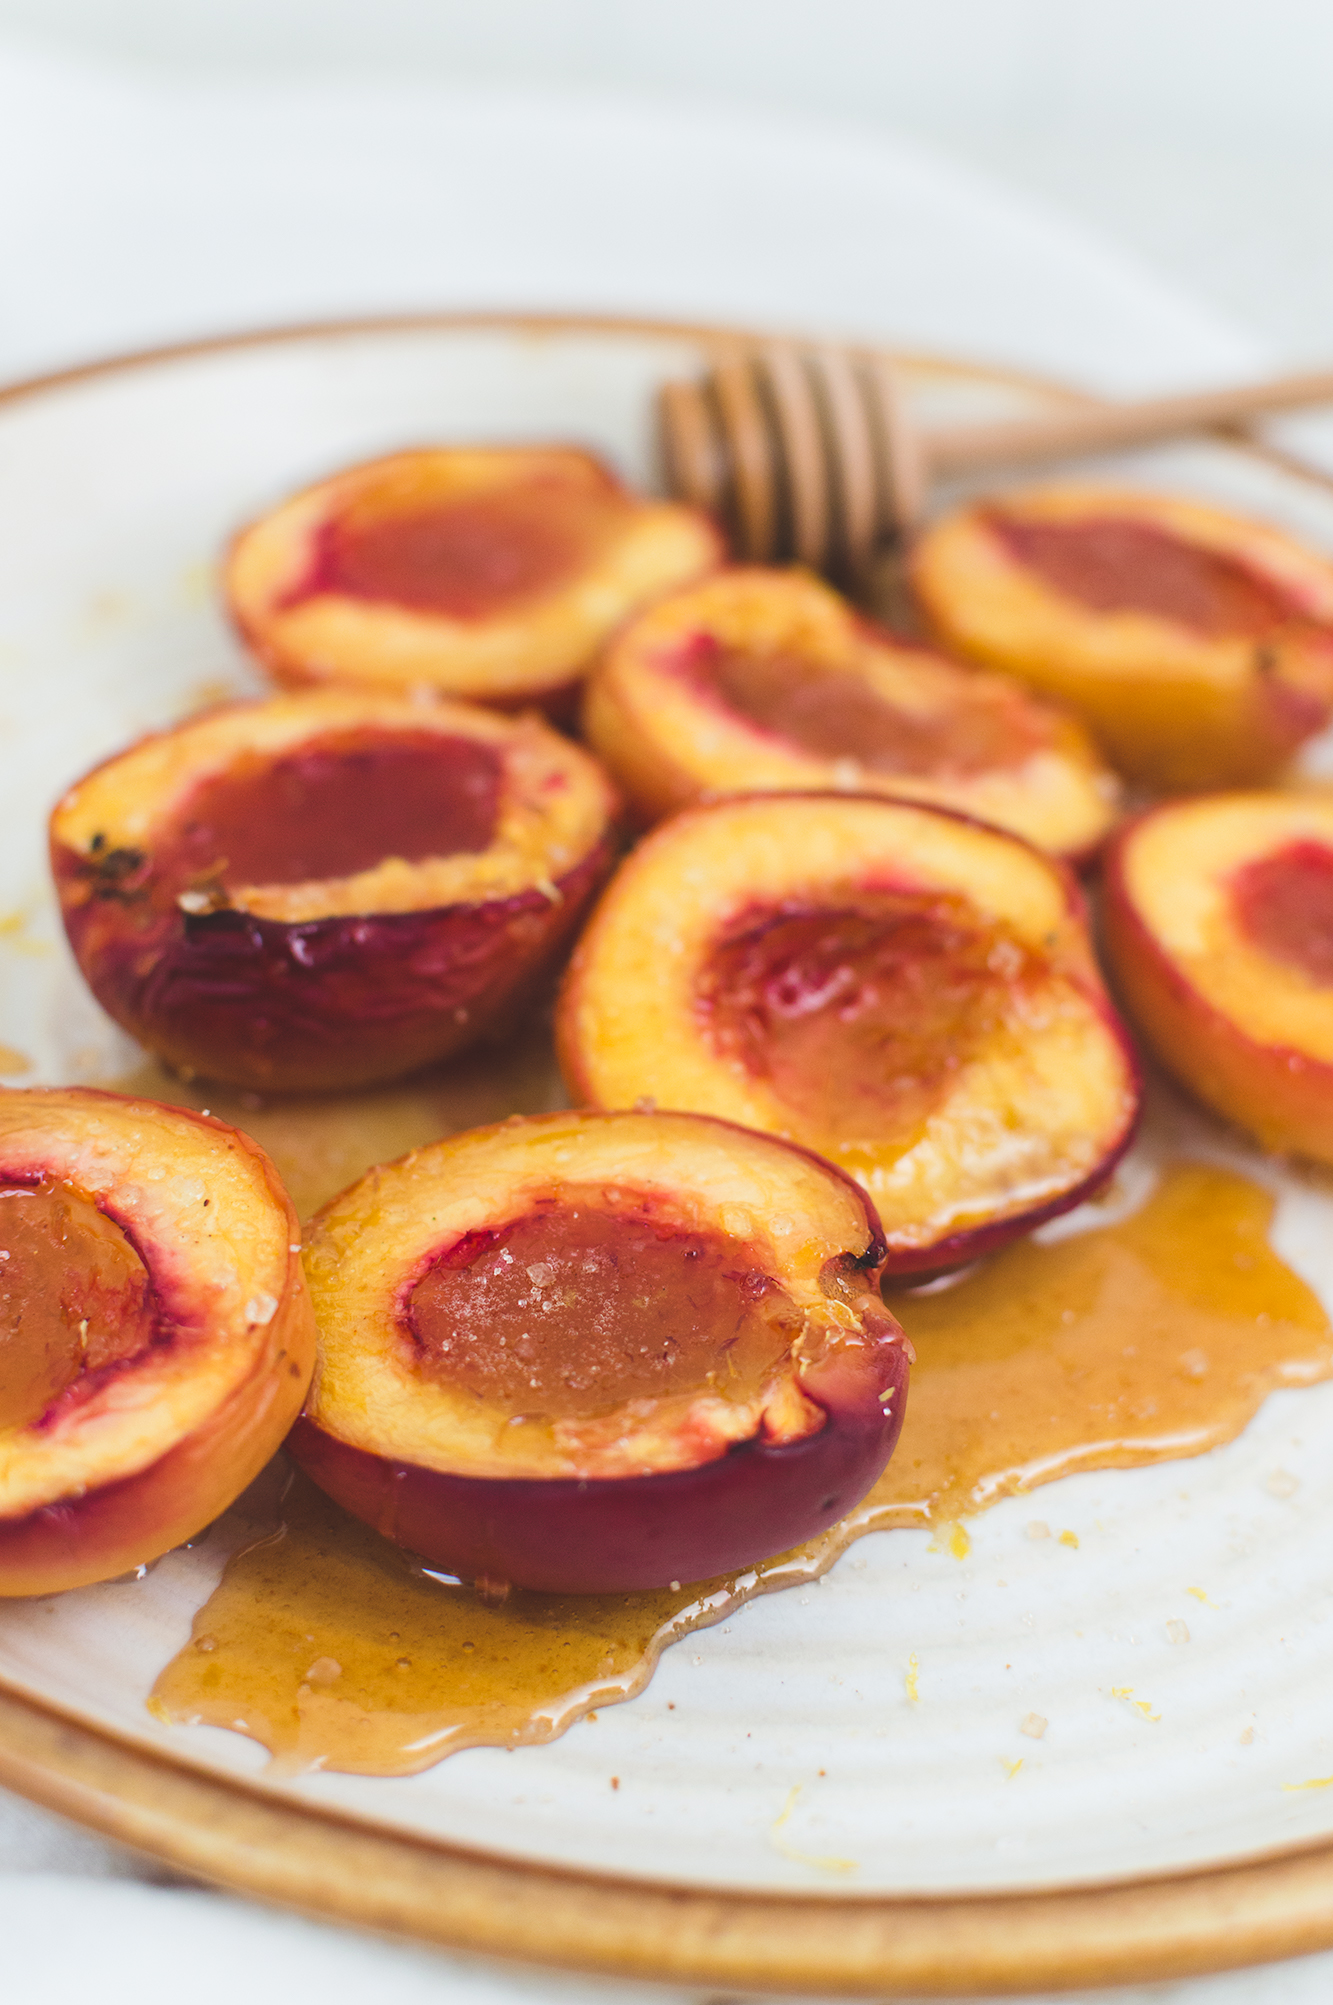 nectarine-miel-et-lavande-5